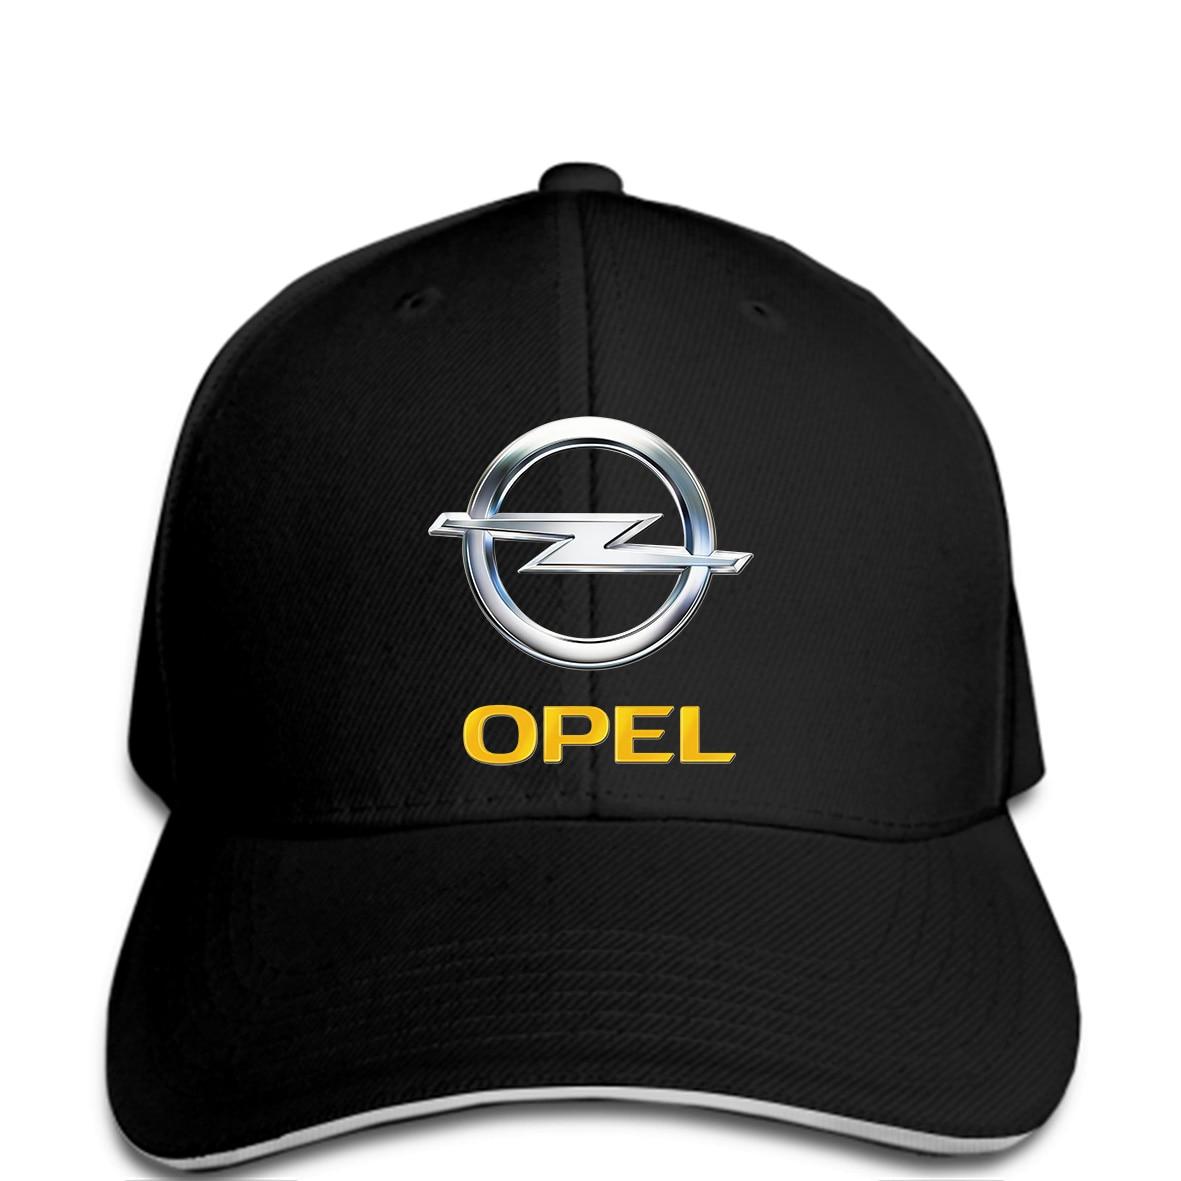 men baseball cap opel logo cars fashion funny hat novelty tsnapback women in baseball caps from men s clothing accessories on aliexpress com alibaba  [ 1181 x 1181 Pixel ]